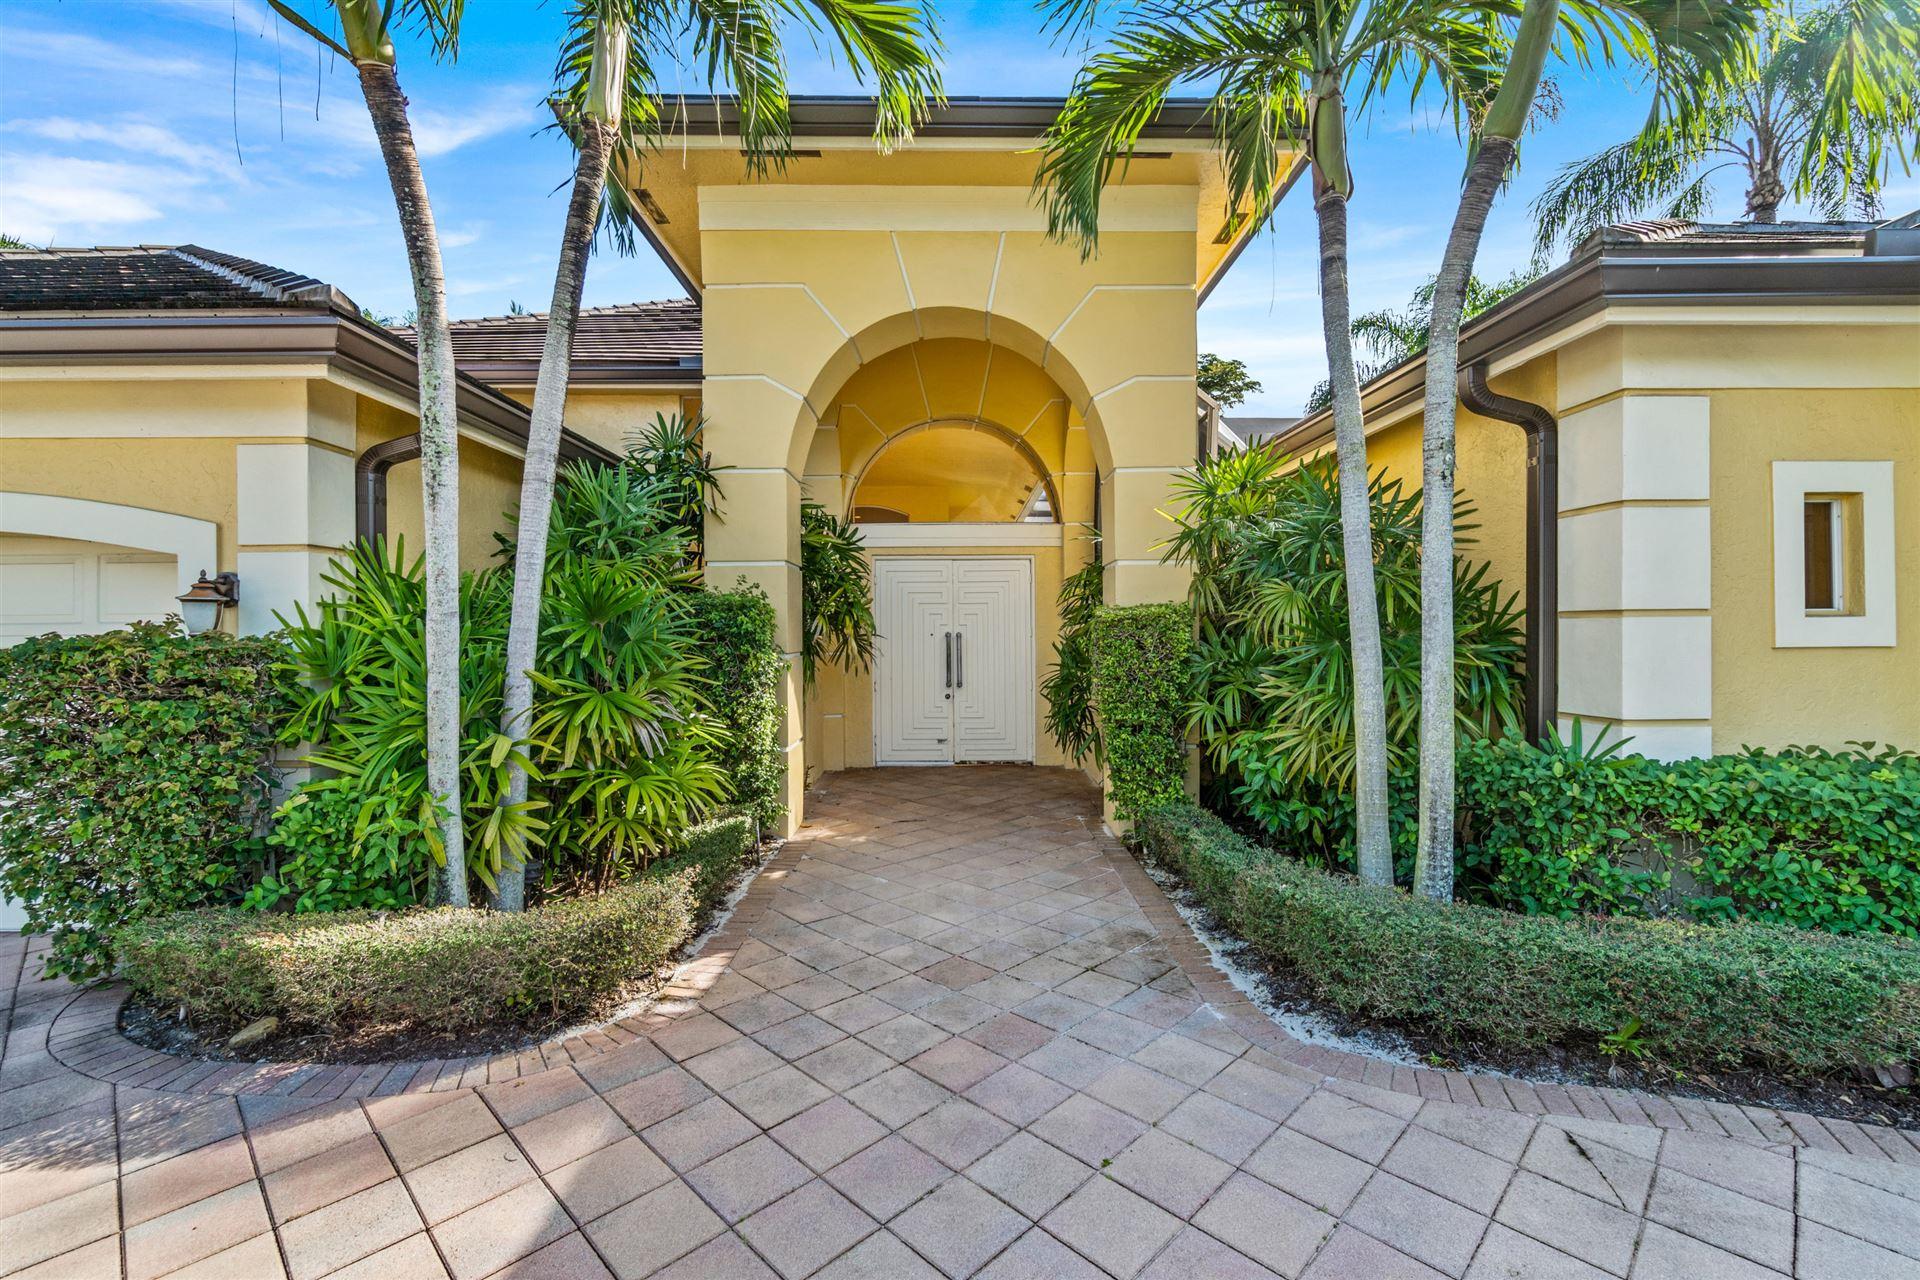 Photo of 7064 Mandarin Dr Drive, Boca Raton, FL 33433 (MLS # RX-10674707)